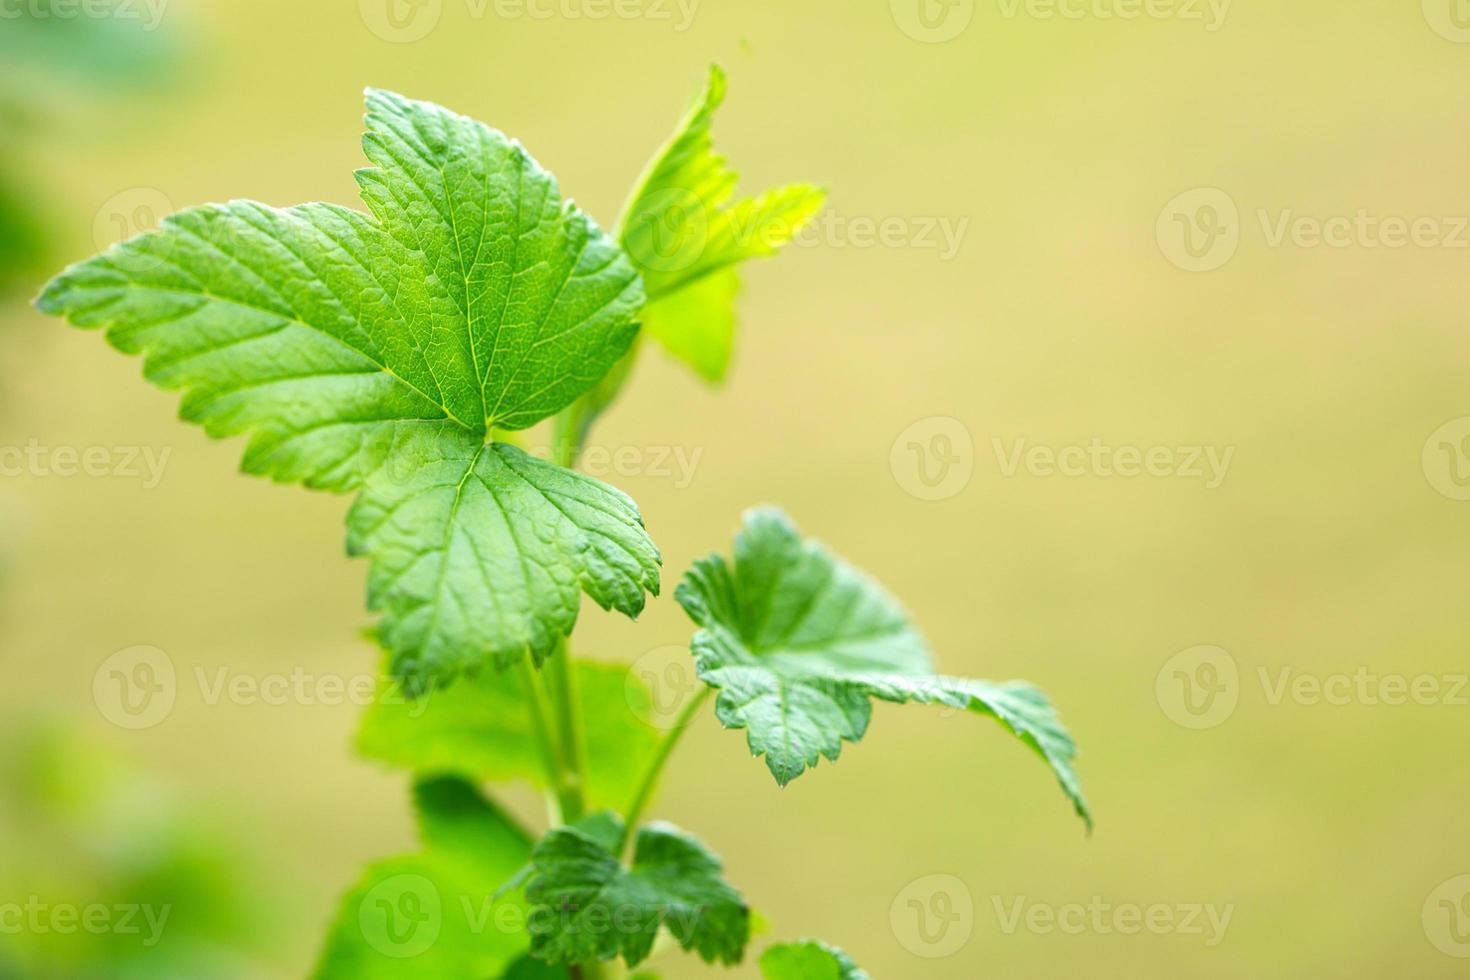 grüne Blätter, Makroaufnahme. foto